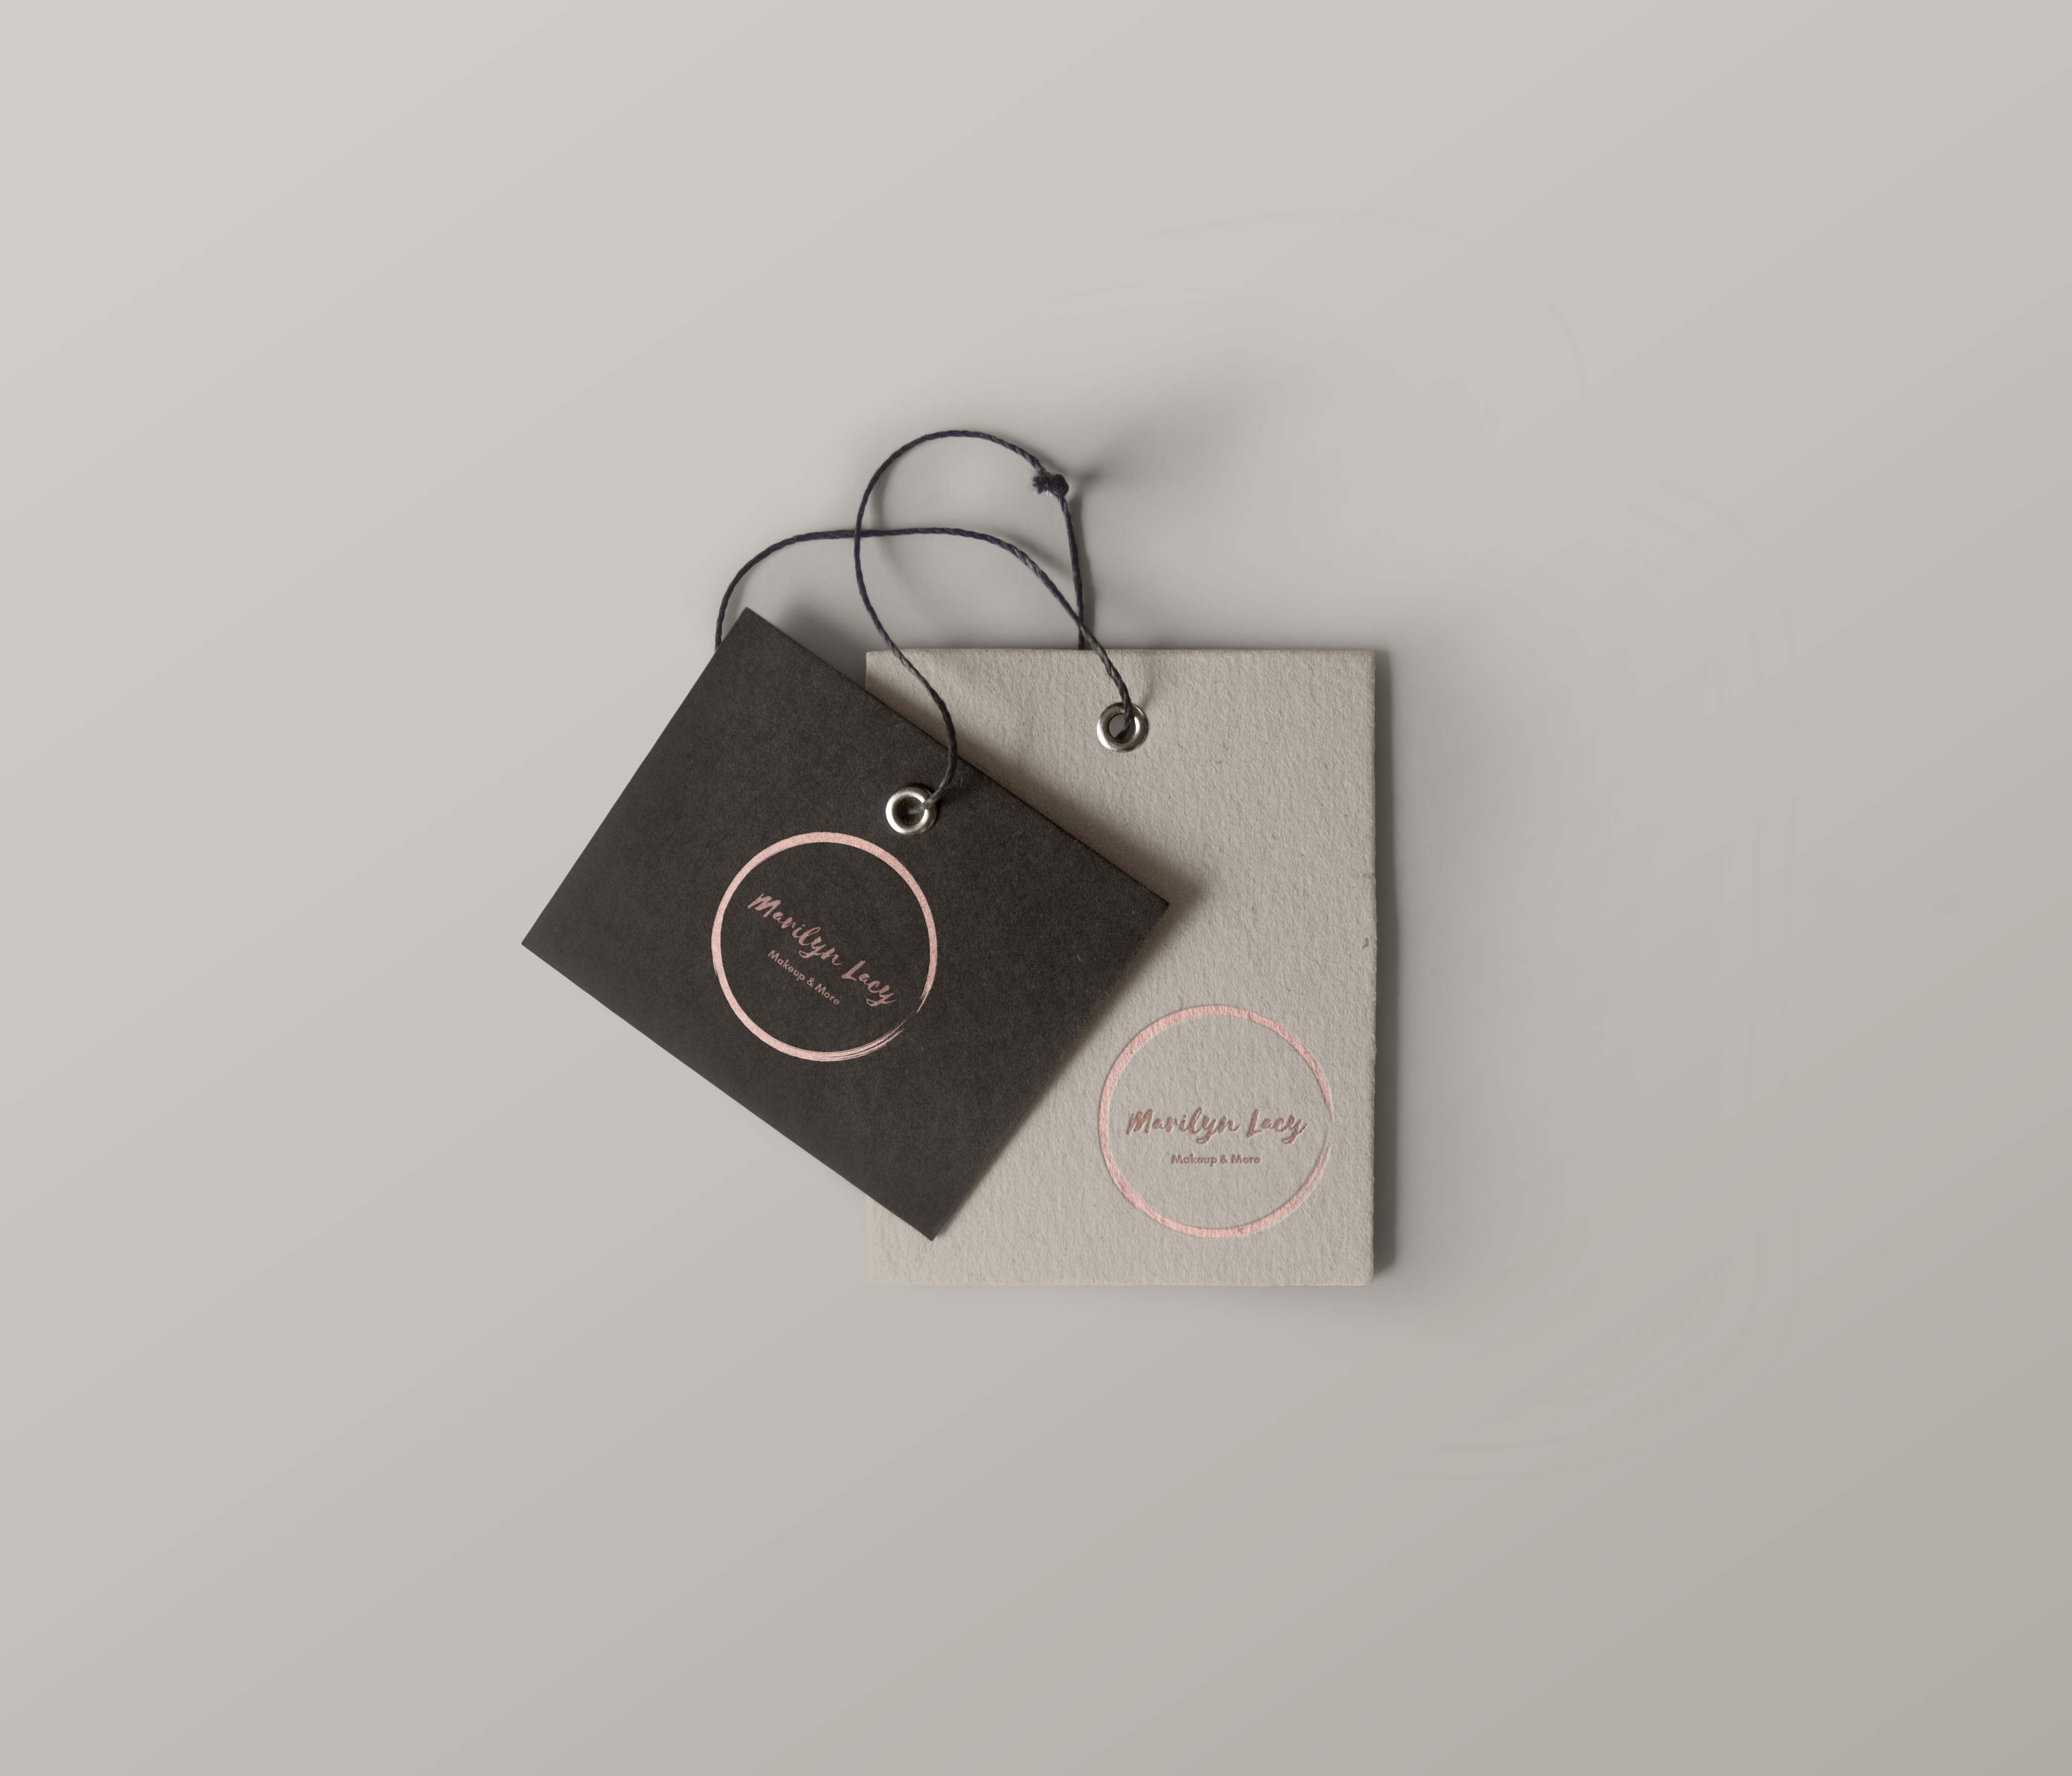 Marilyin Lacy Label Brand